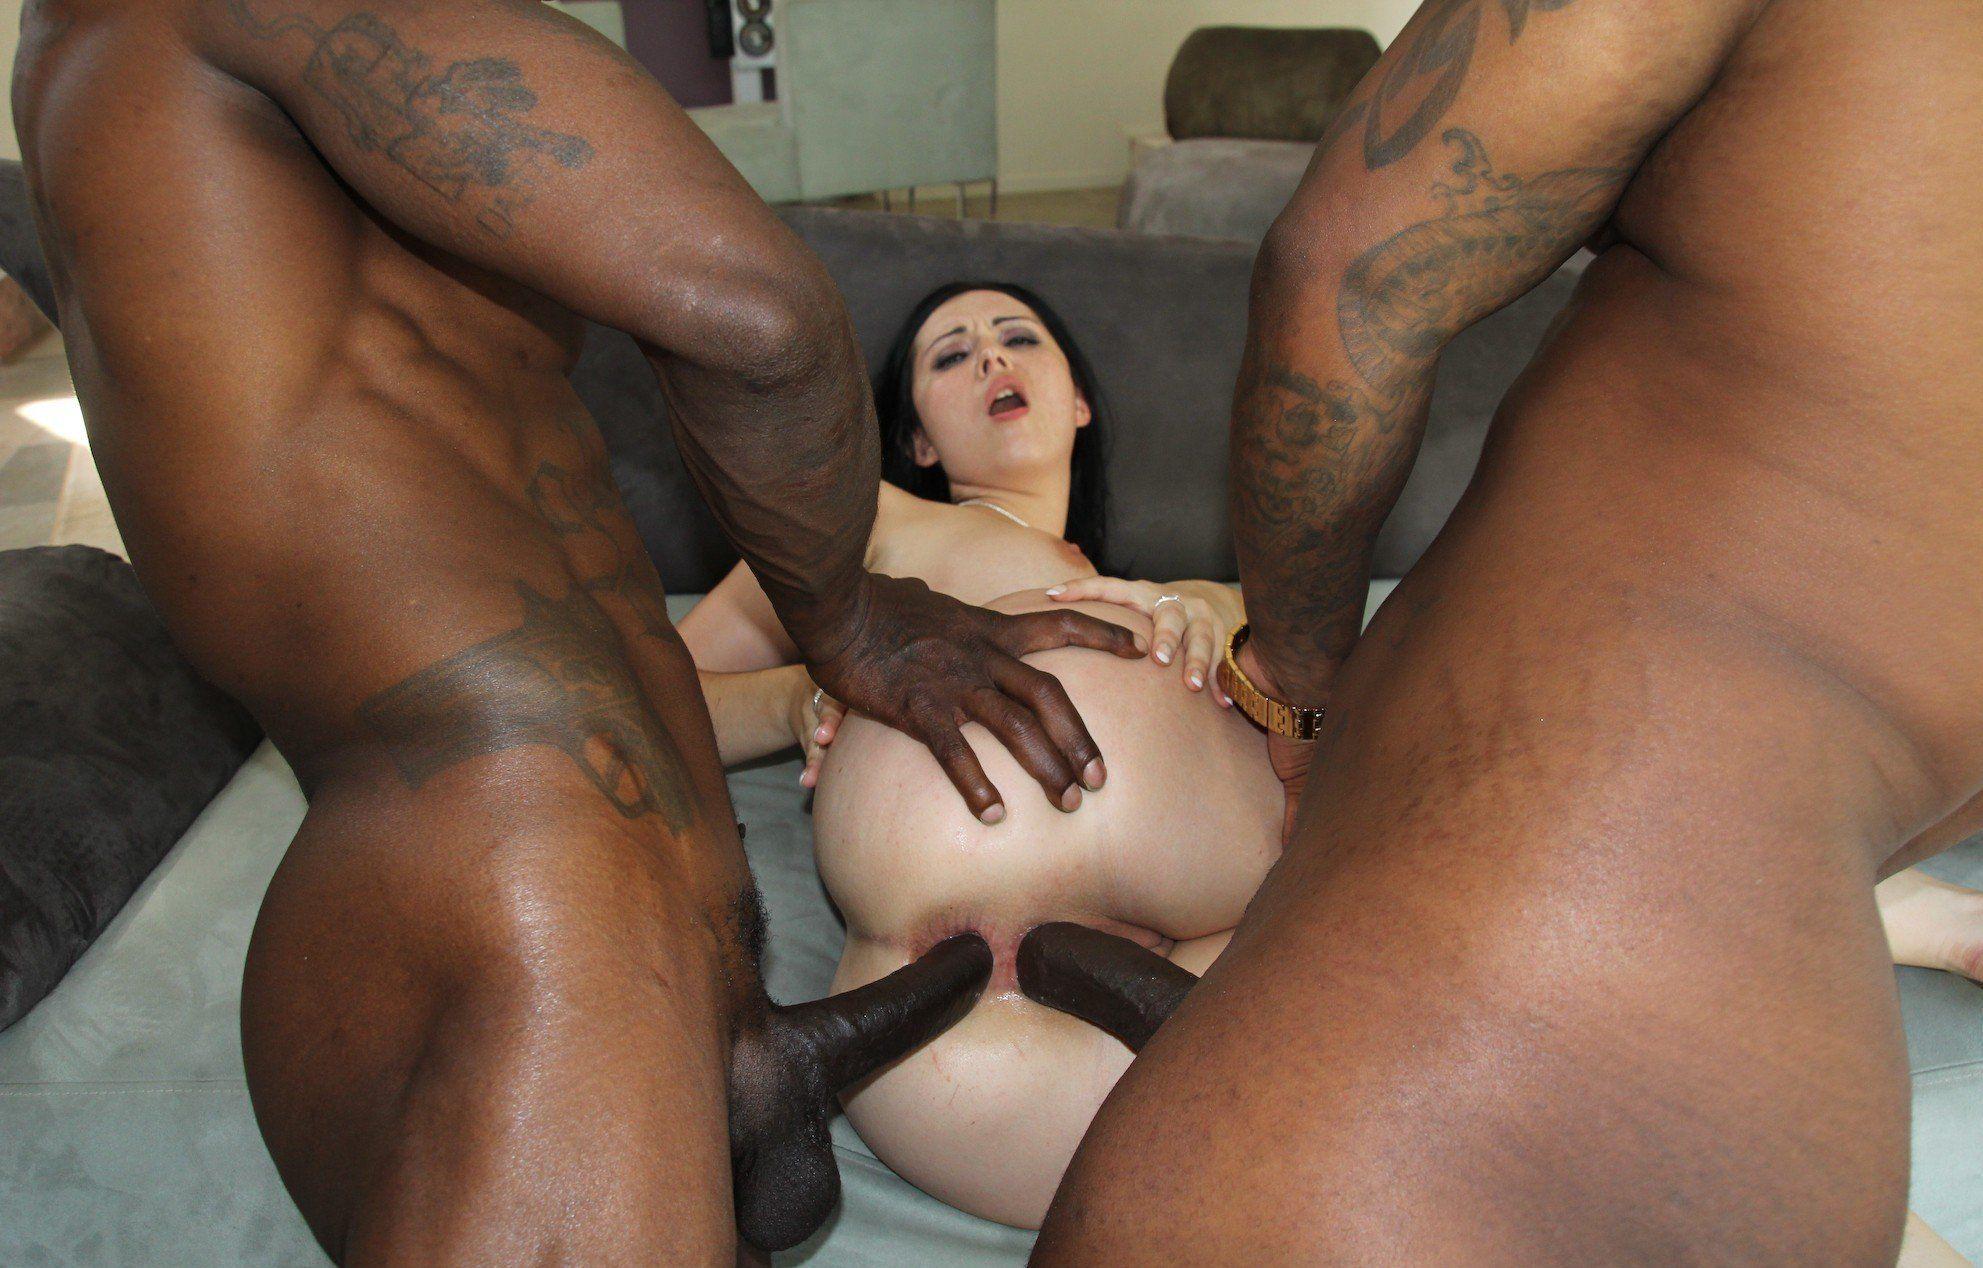 Inter racial dobule penetration